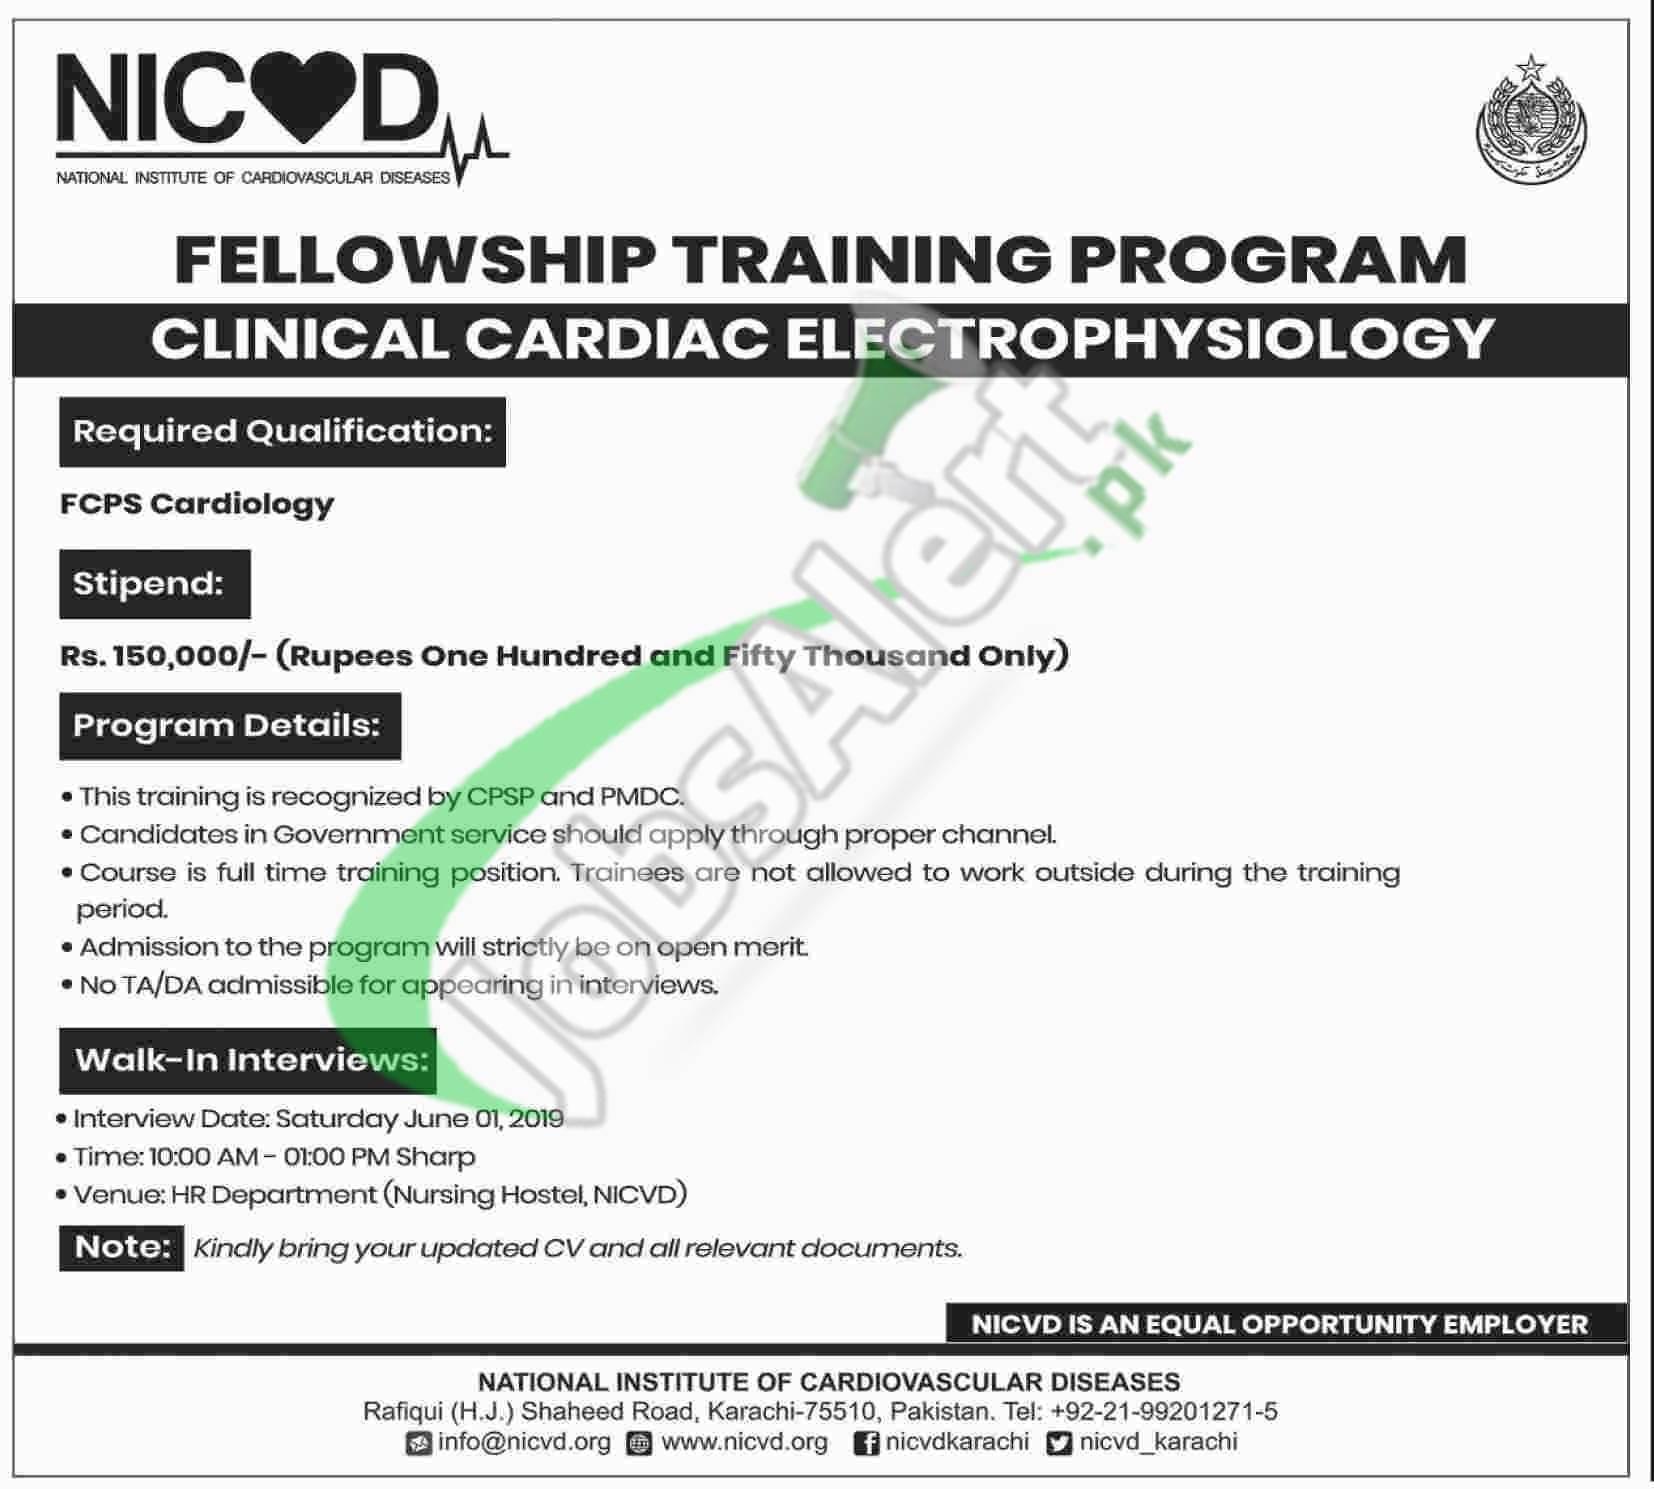 NIVCD Fellowship